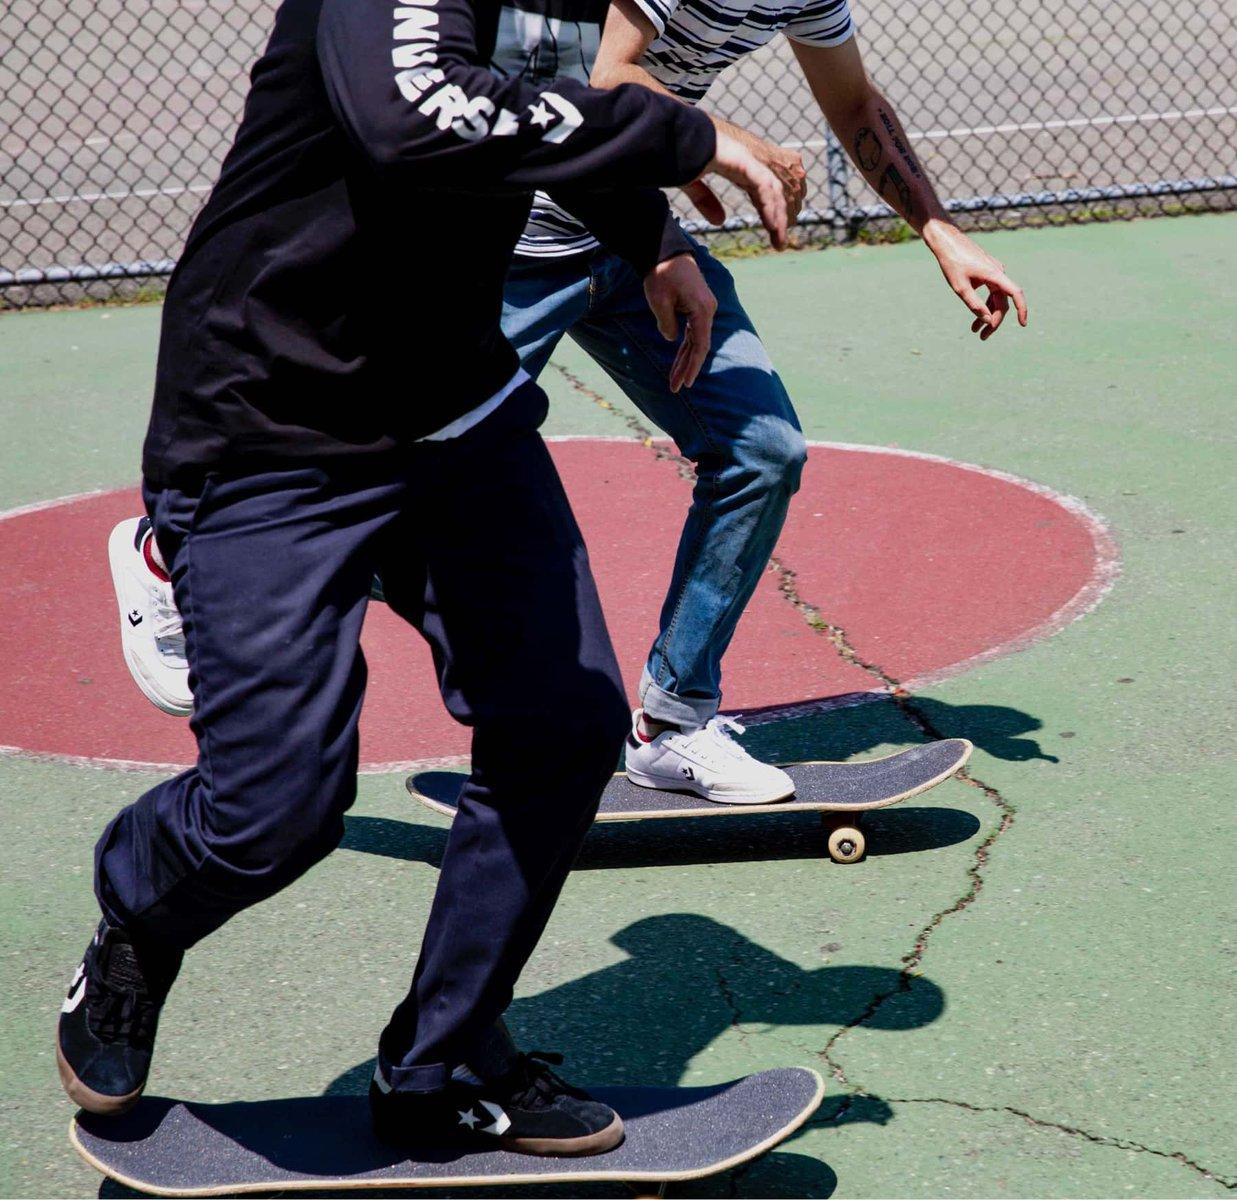 converse skate team france